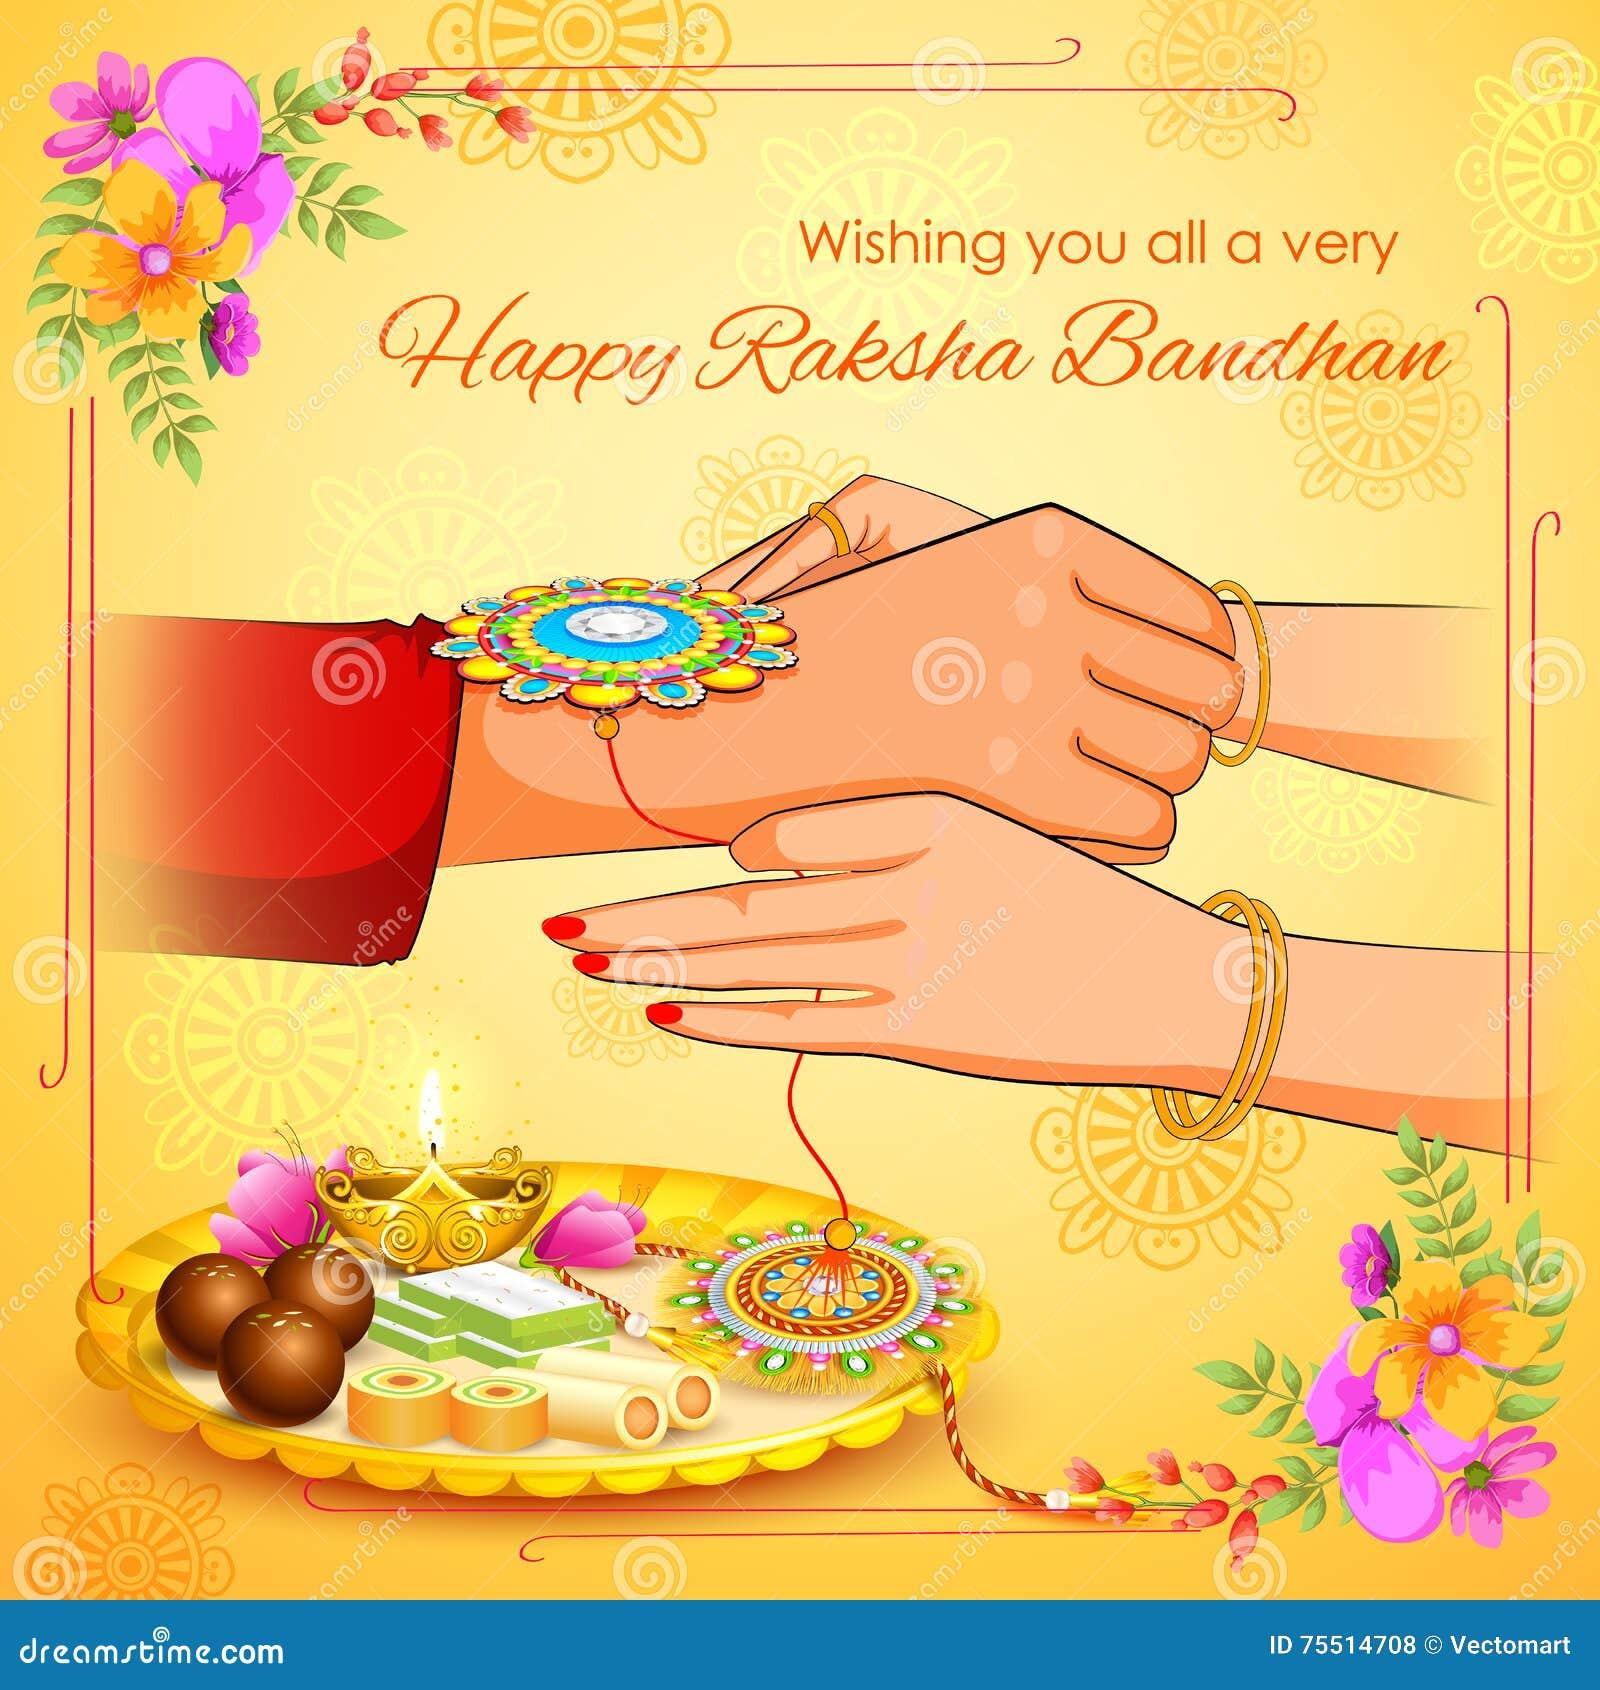 Brother And Sister Tying Rakhi On Raksha Bandhan Stock Vector